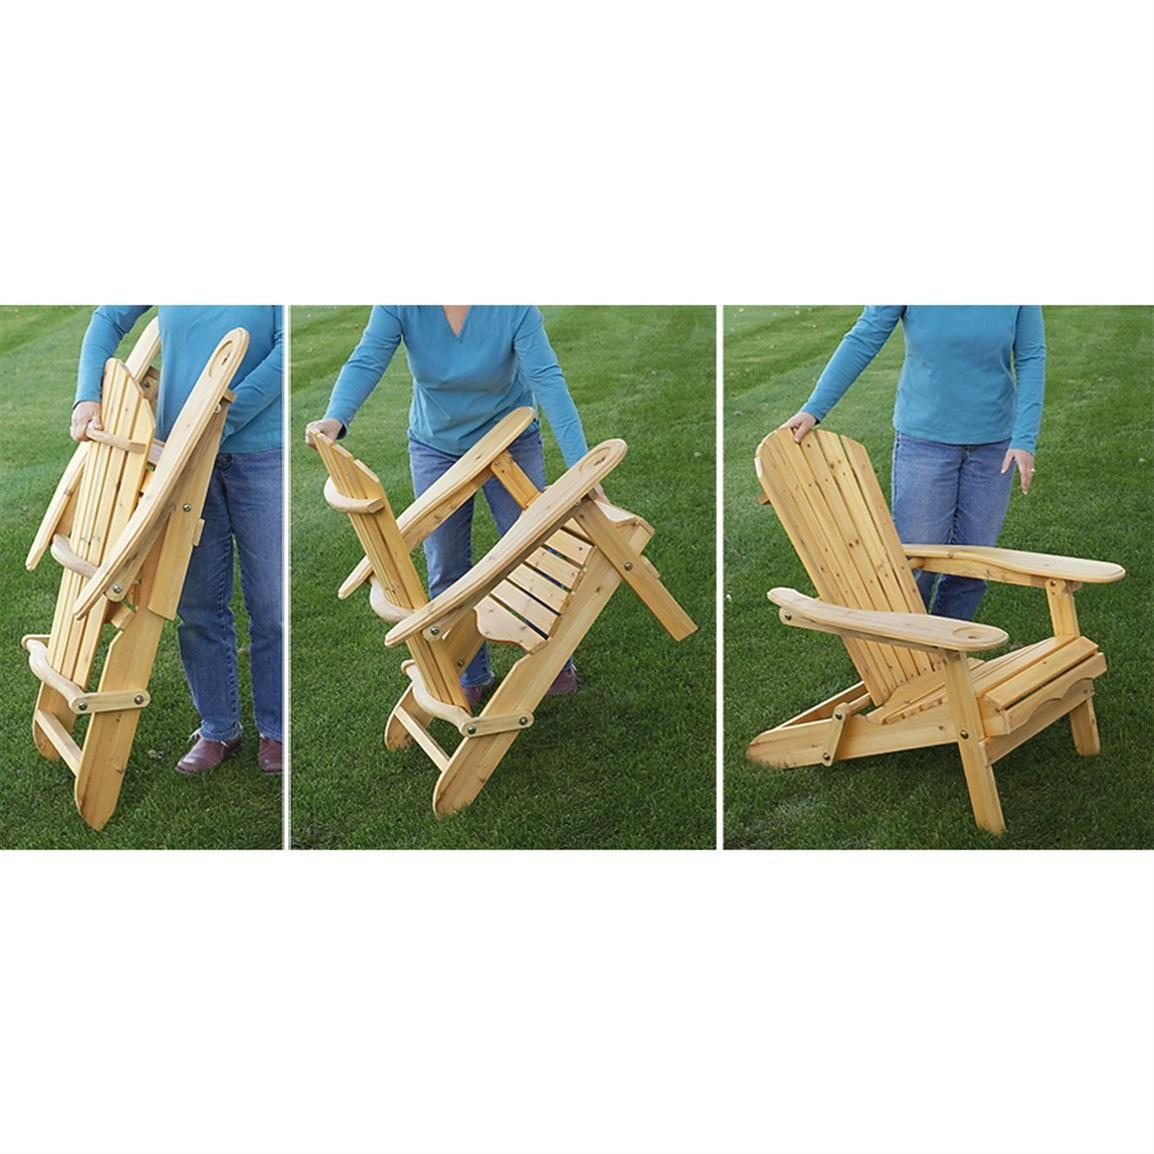 Castlecreek Folding Wood Adirondack Rocking Chair 232380 Patio Furniture At Sportsman S Guide